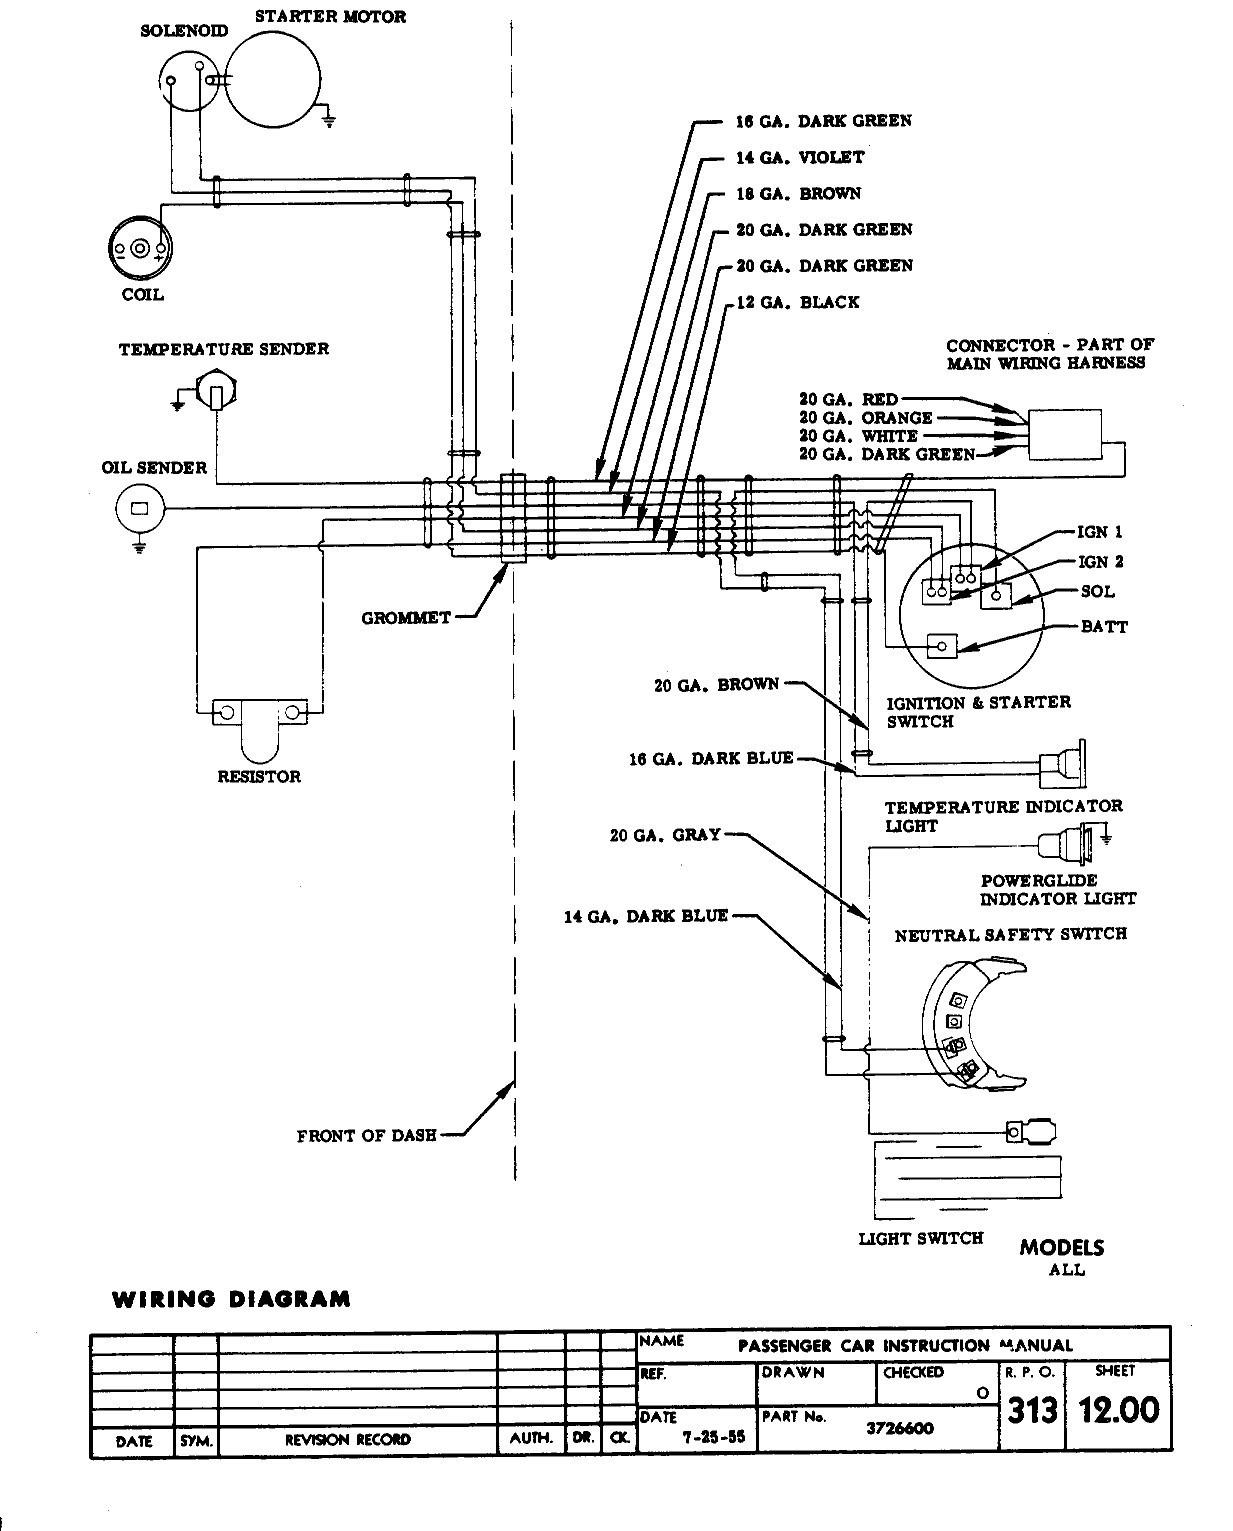 Chevy Truck Wiring Diagram In Addition 1980 Chevy Truck Wiring Diagram